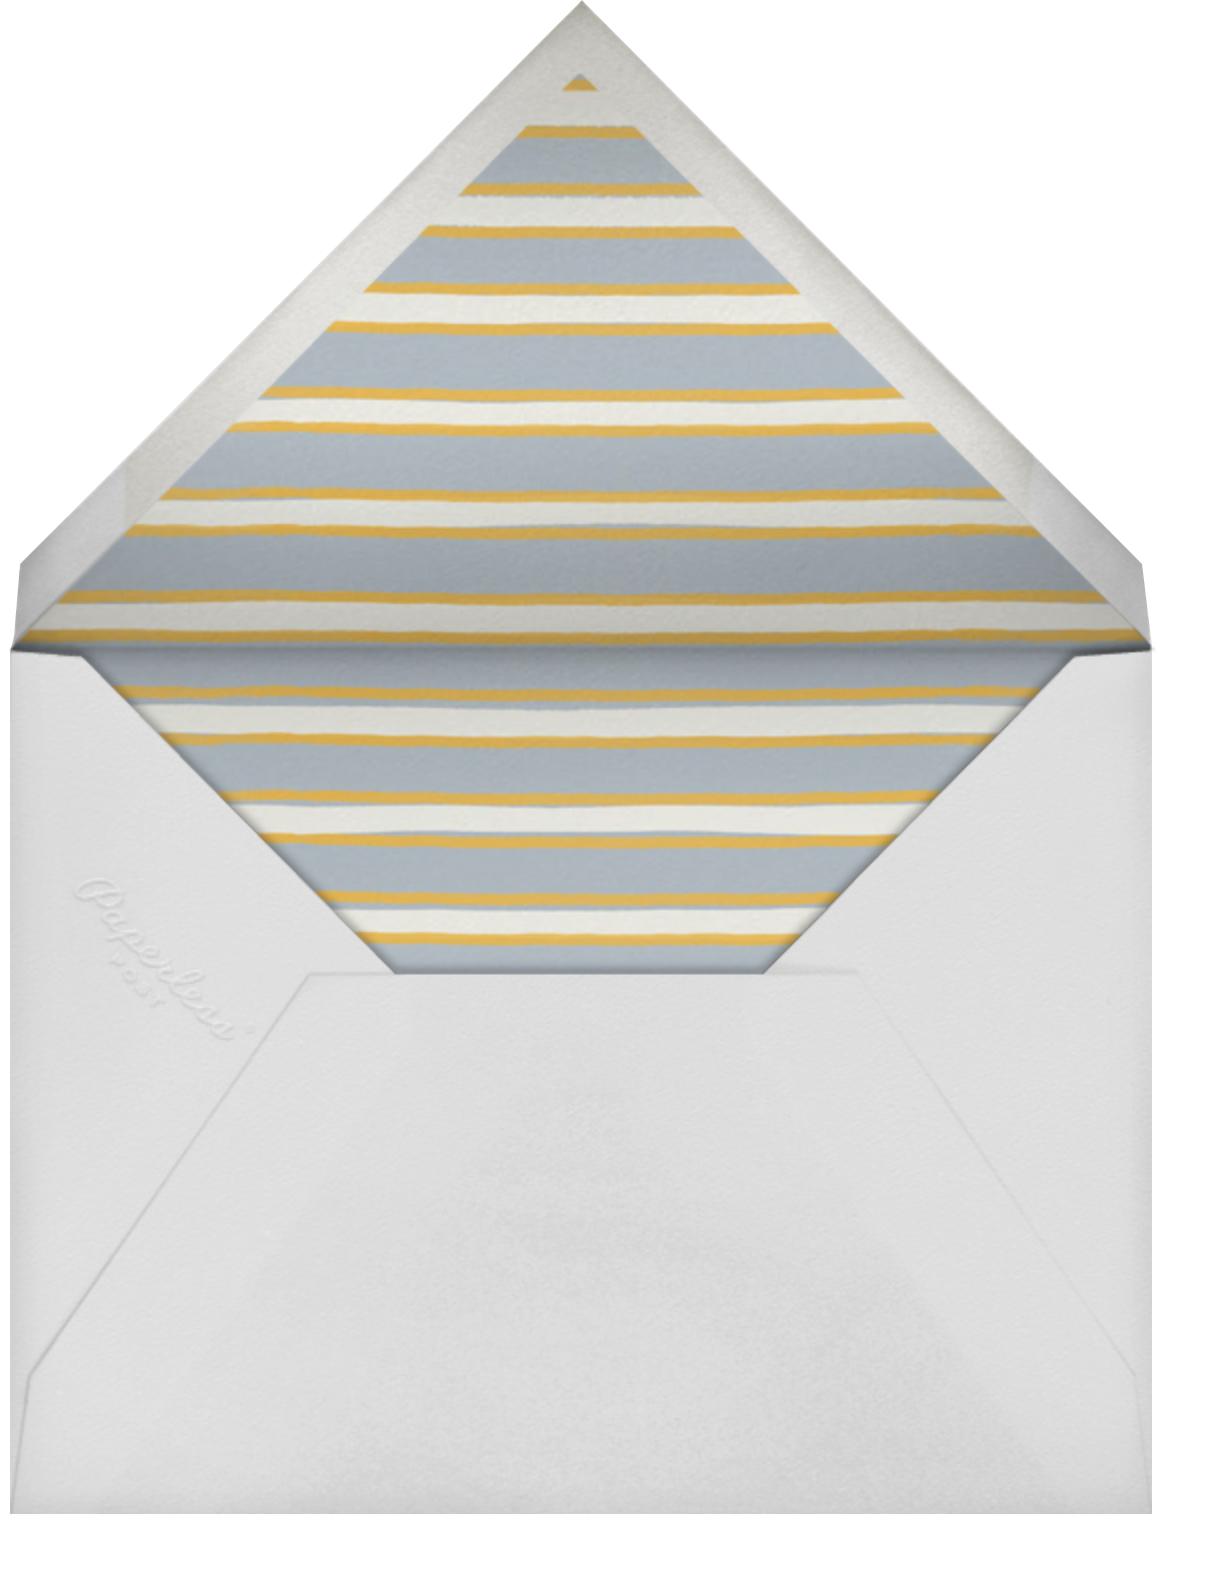 Floral Circle - Cream Mango Pacific - Paperless Post - Envelope